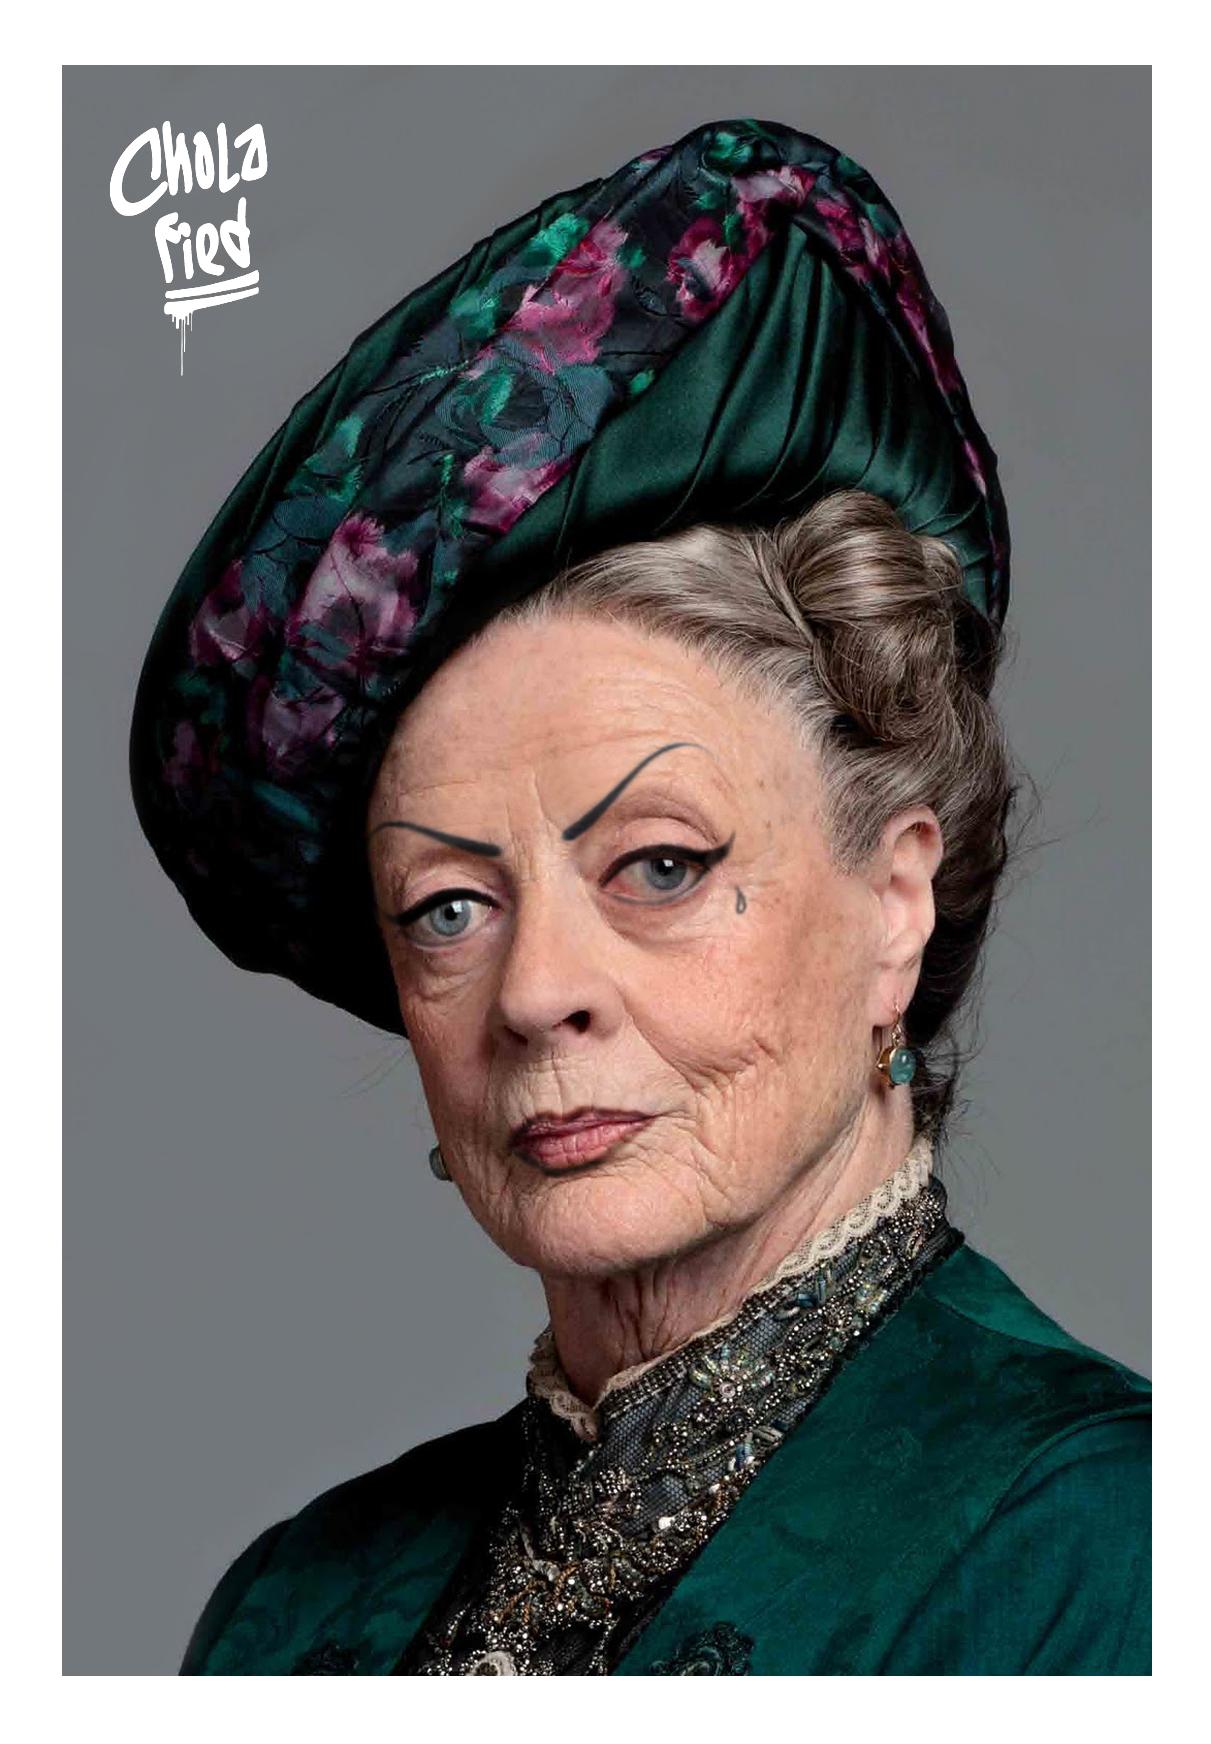 chola dowager countess of grantham